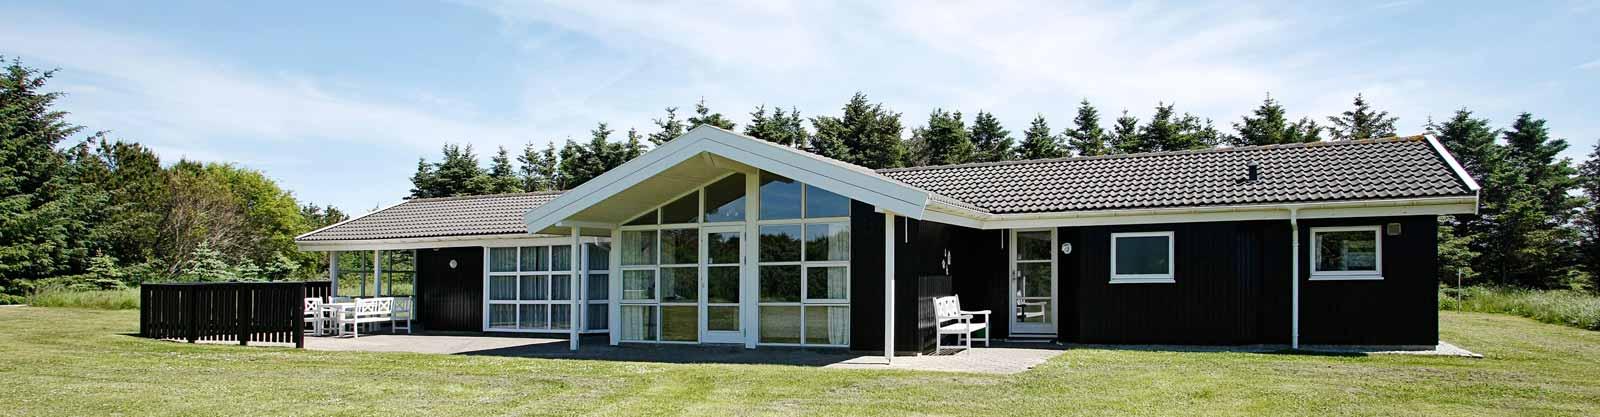 d nemark ferienhaus mit pool dancenter. Black Bedroom Furniture Sets. Home Design Ideas